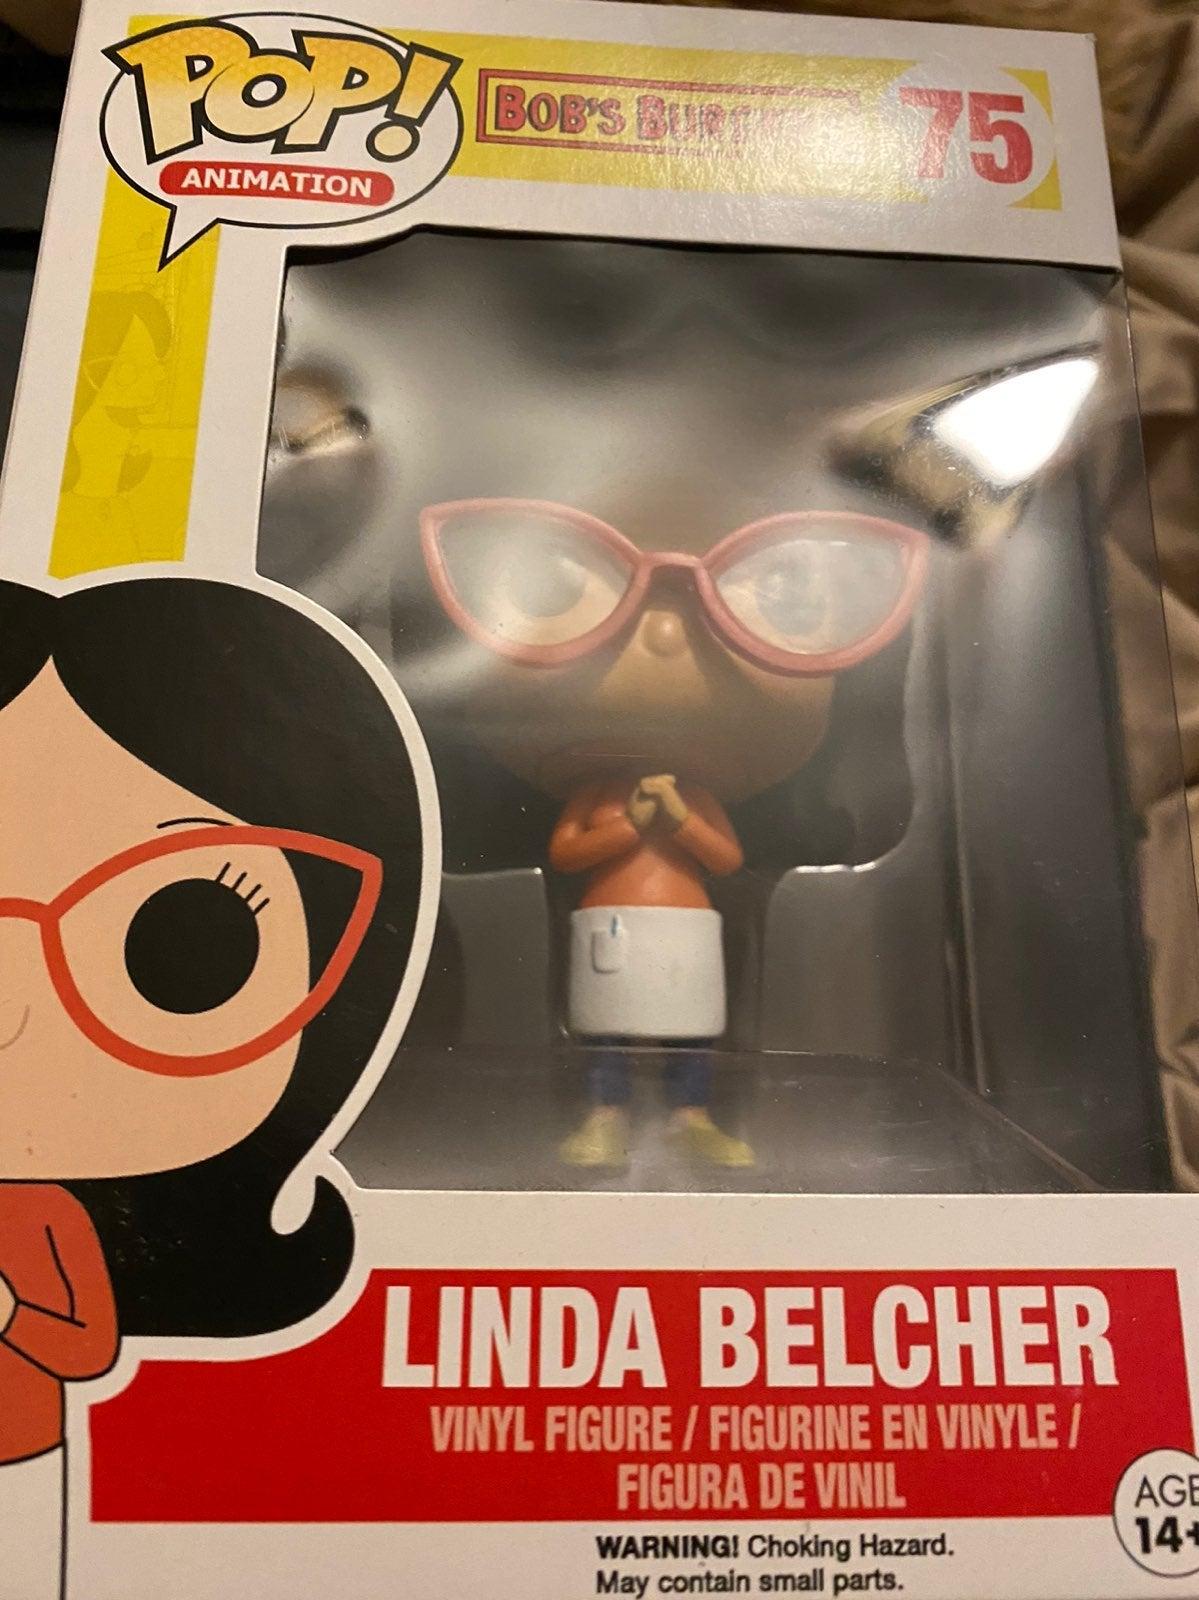 Linda Belcher Bob's Burgers Funko Pop!